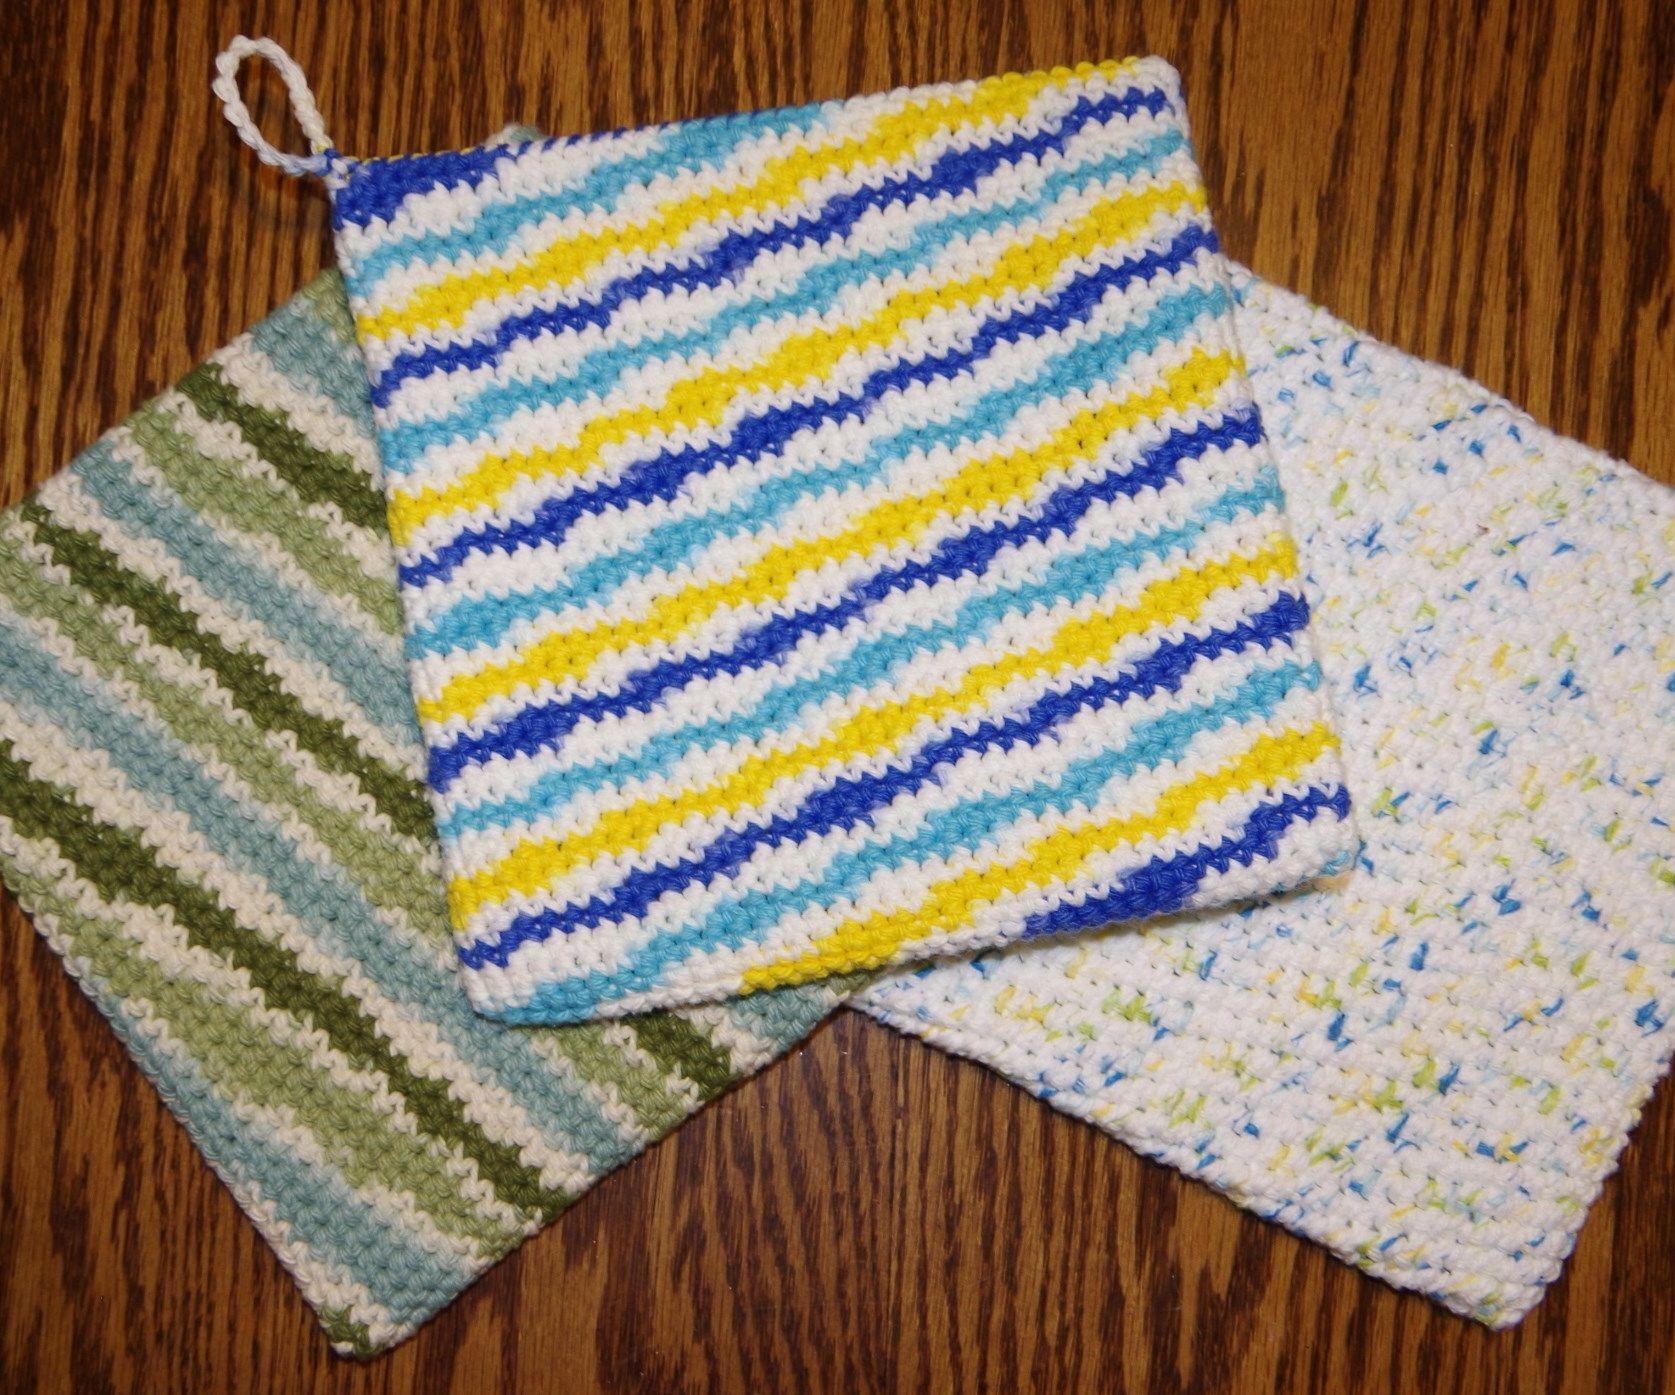 Double Thick Single Crochet Potholder